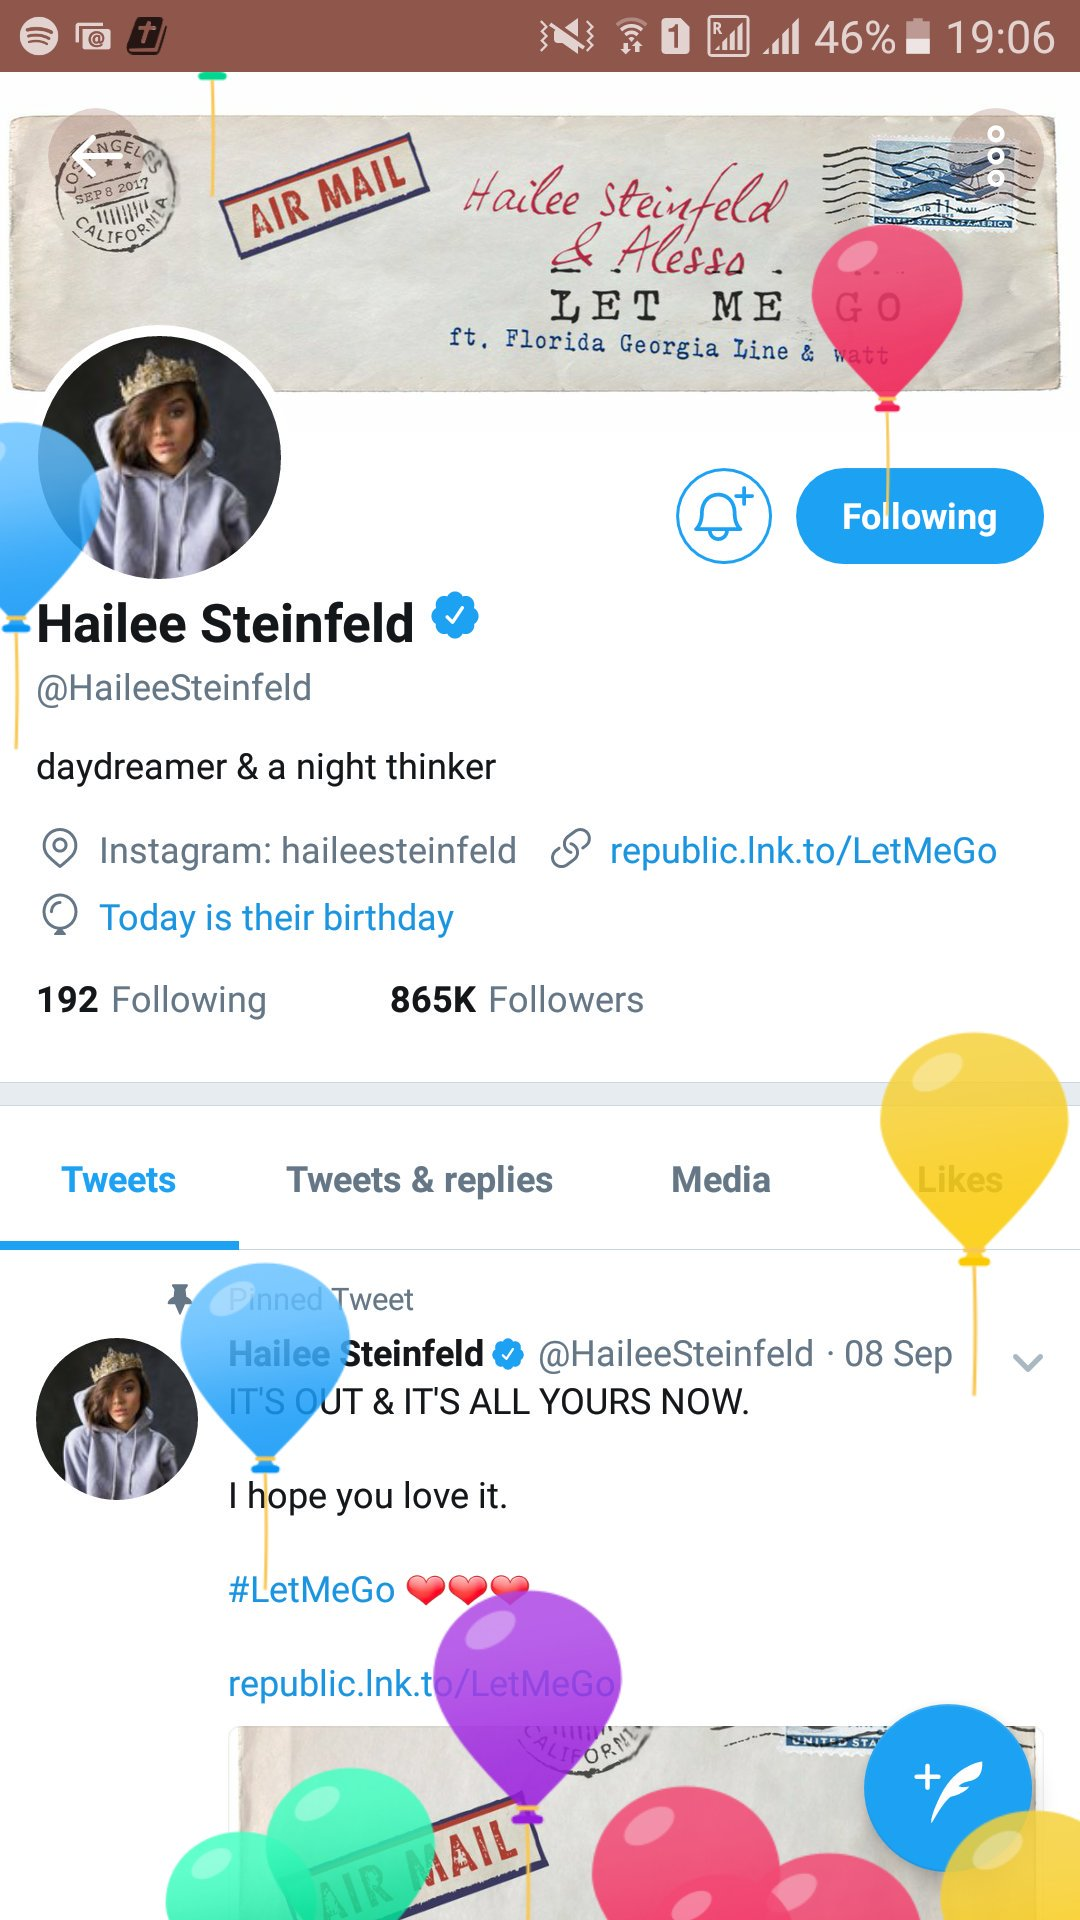 HAPPY BIRTHDAY HAILEE STEINFELD I WISH YOU ALL THE BEST. ENJOY YOUR DAAAAY.